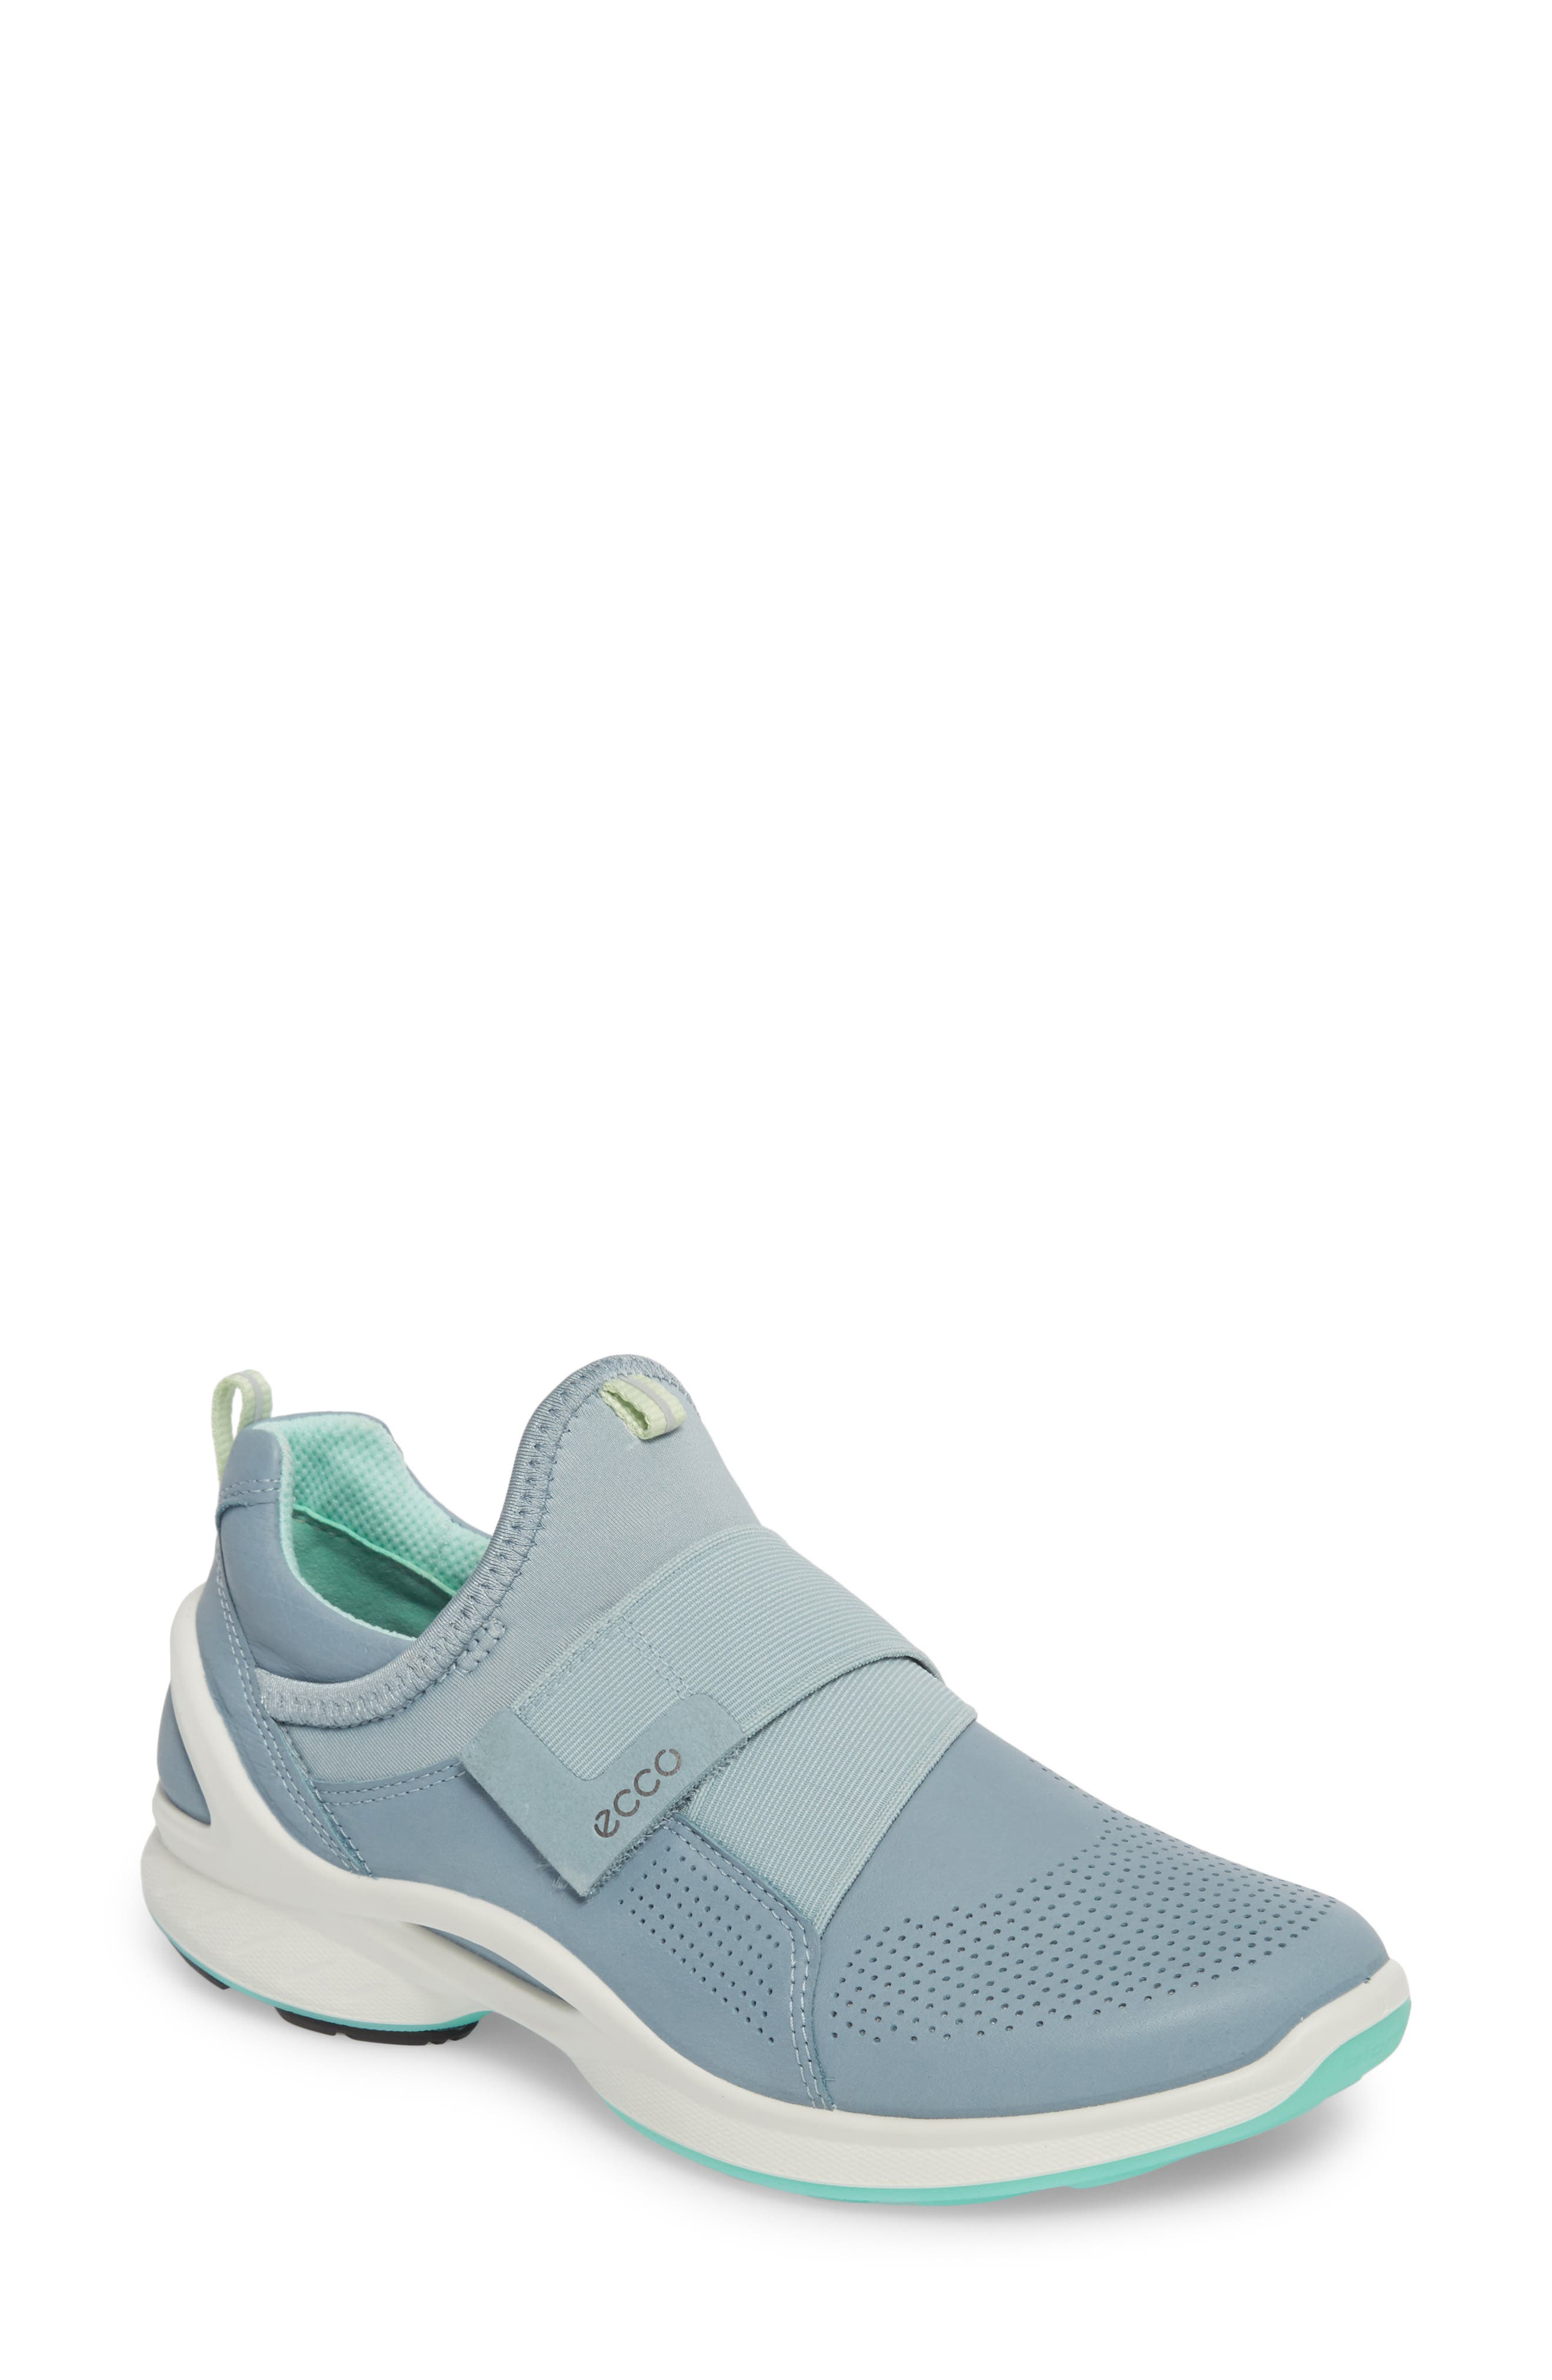 BIOM Fjuel Band Sneaker,                         Main,                         color, Arona Fabric